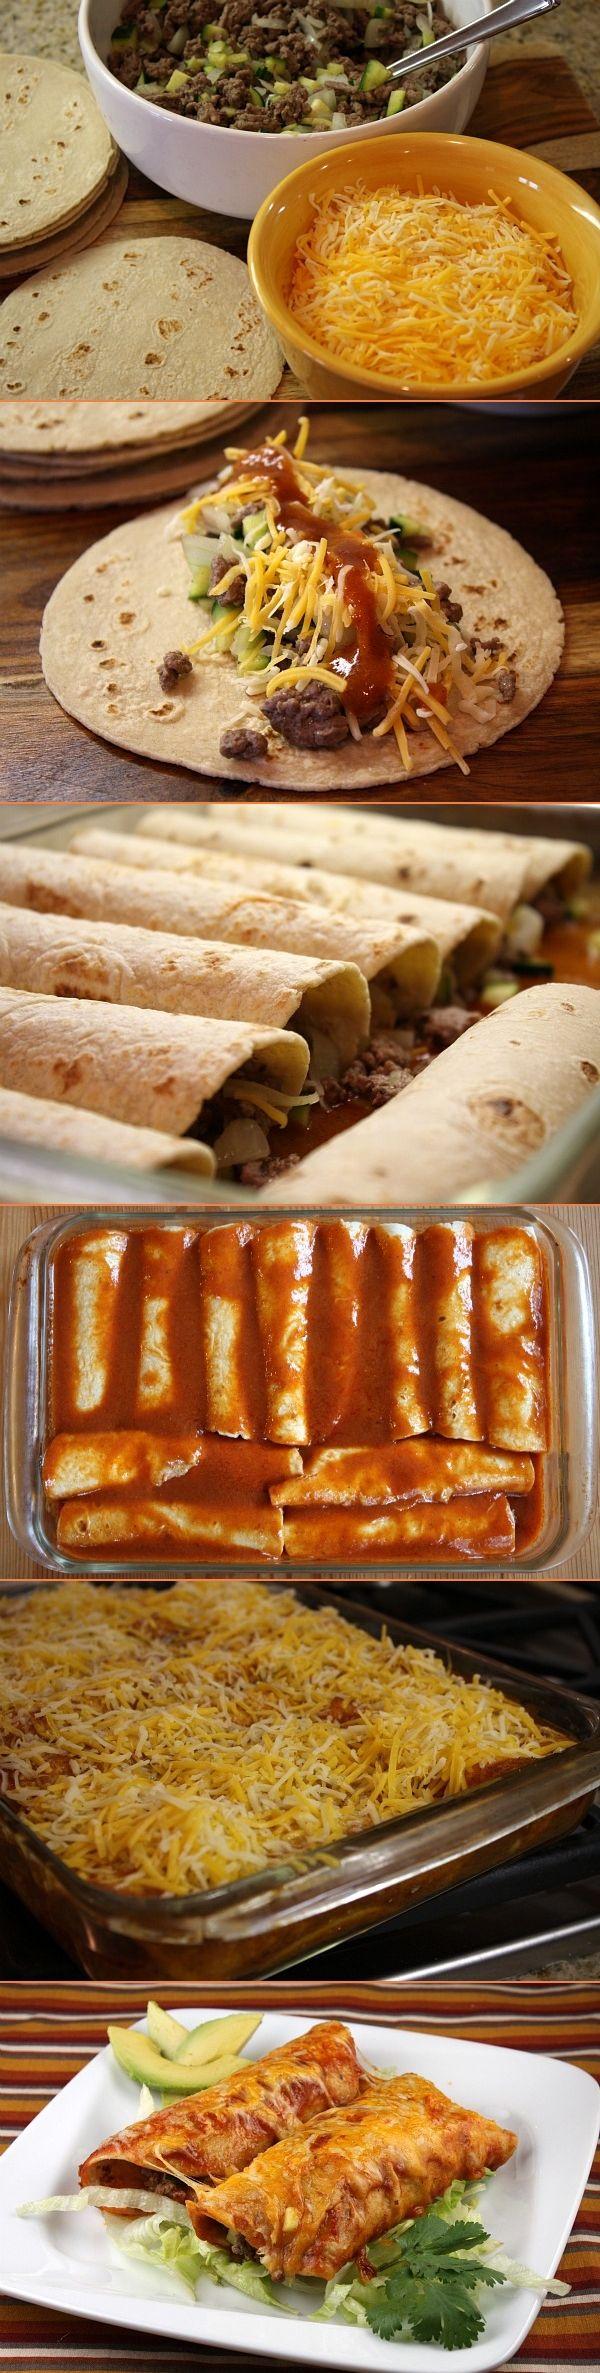 Easy Beef Enchiladas Recipe Food Recipes Mexican Food